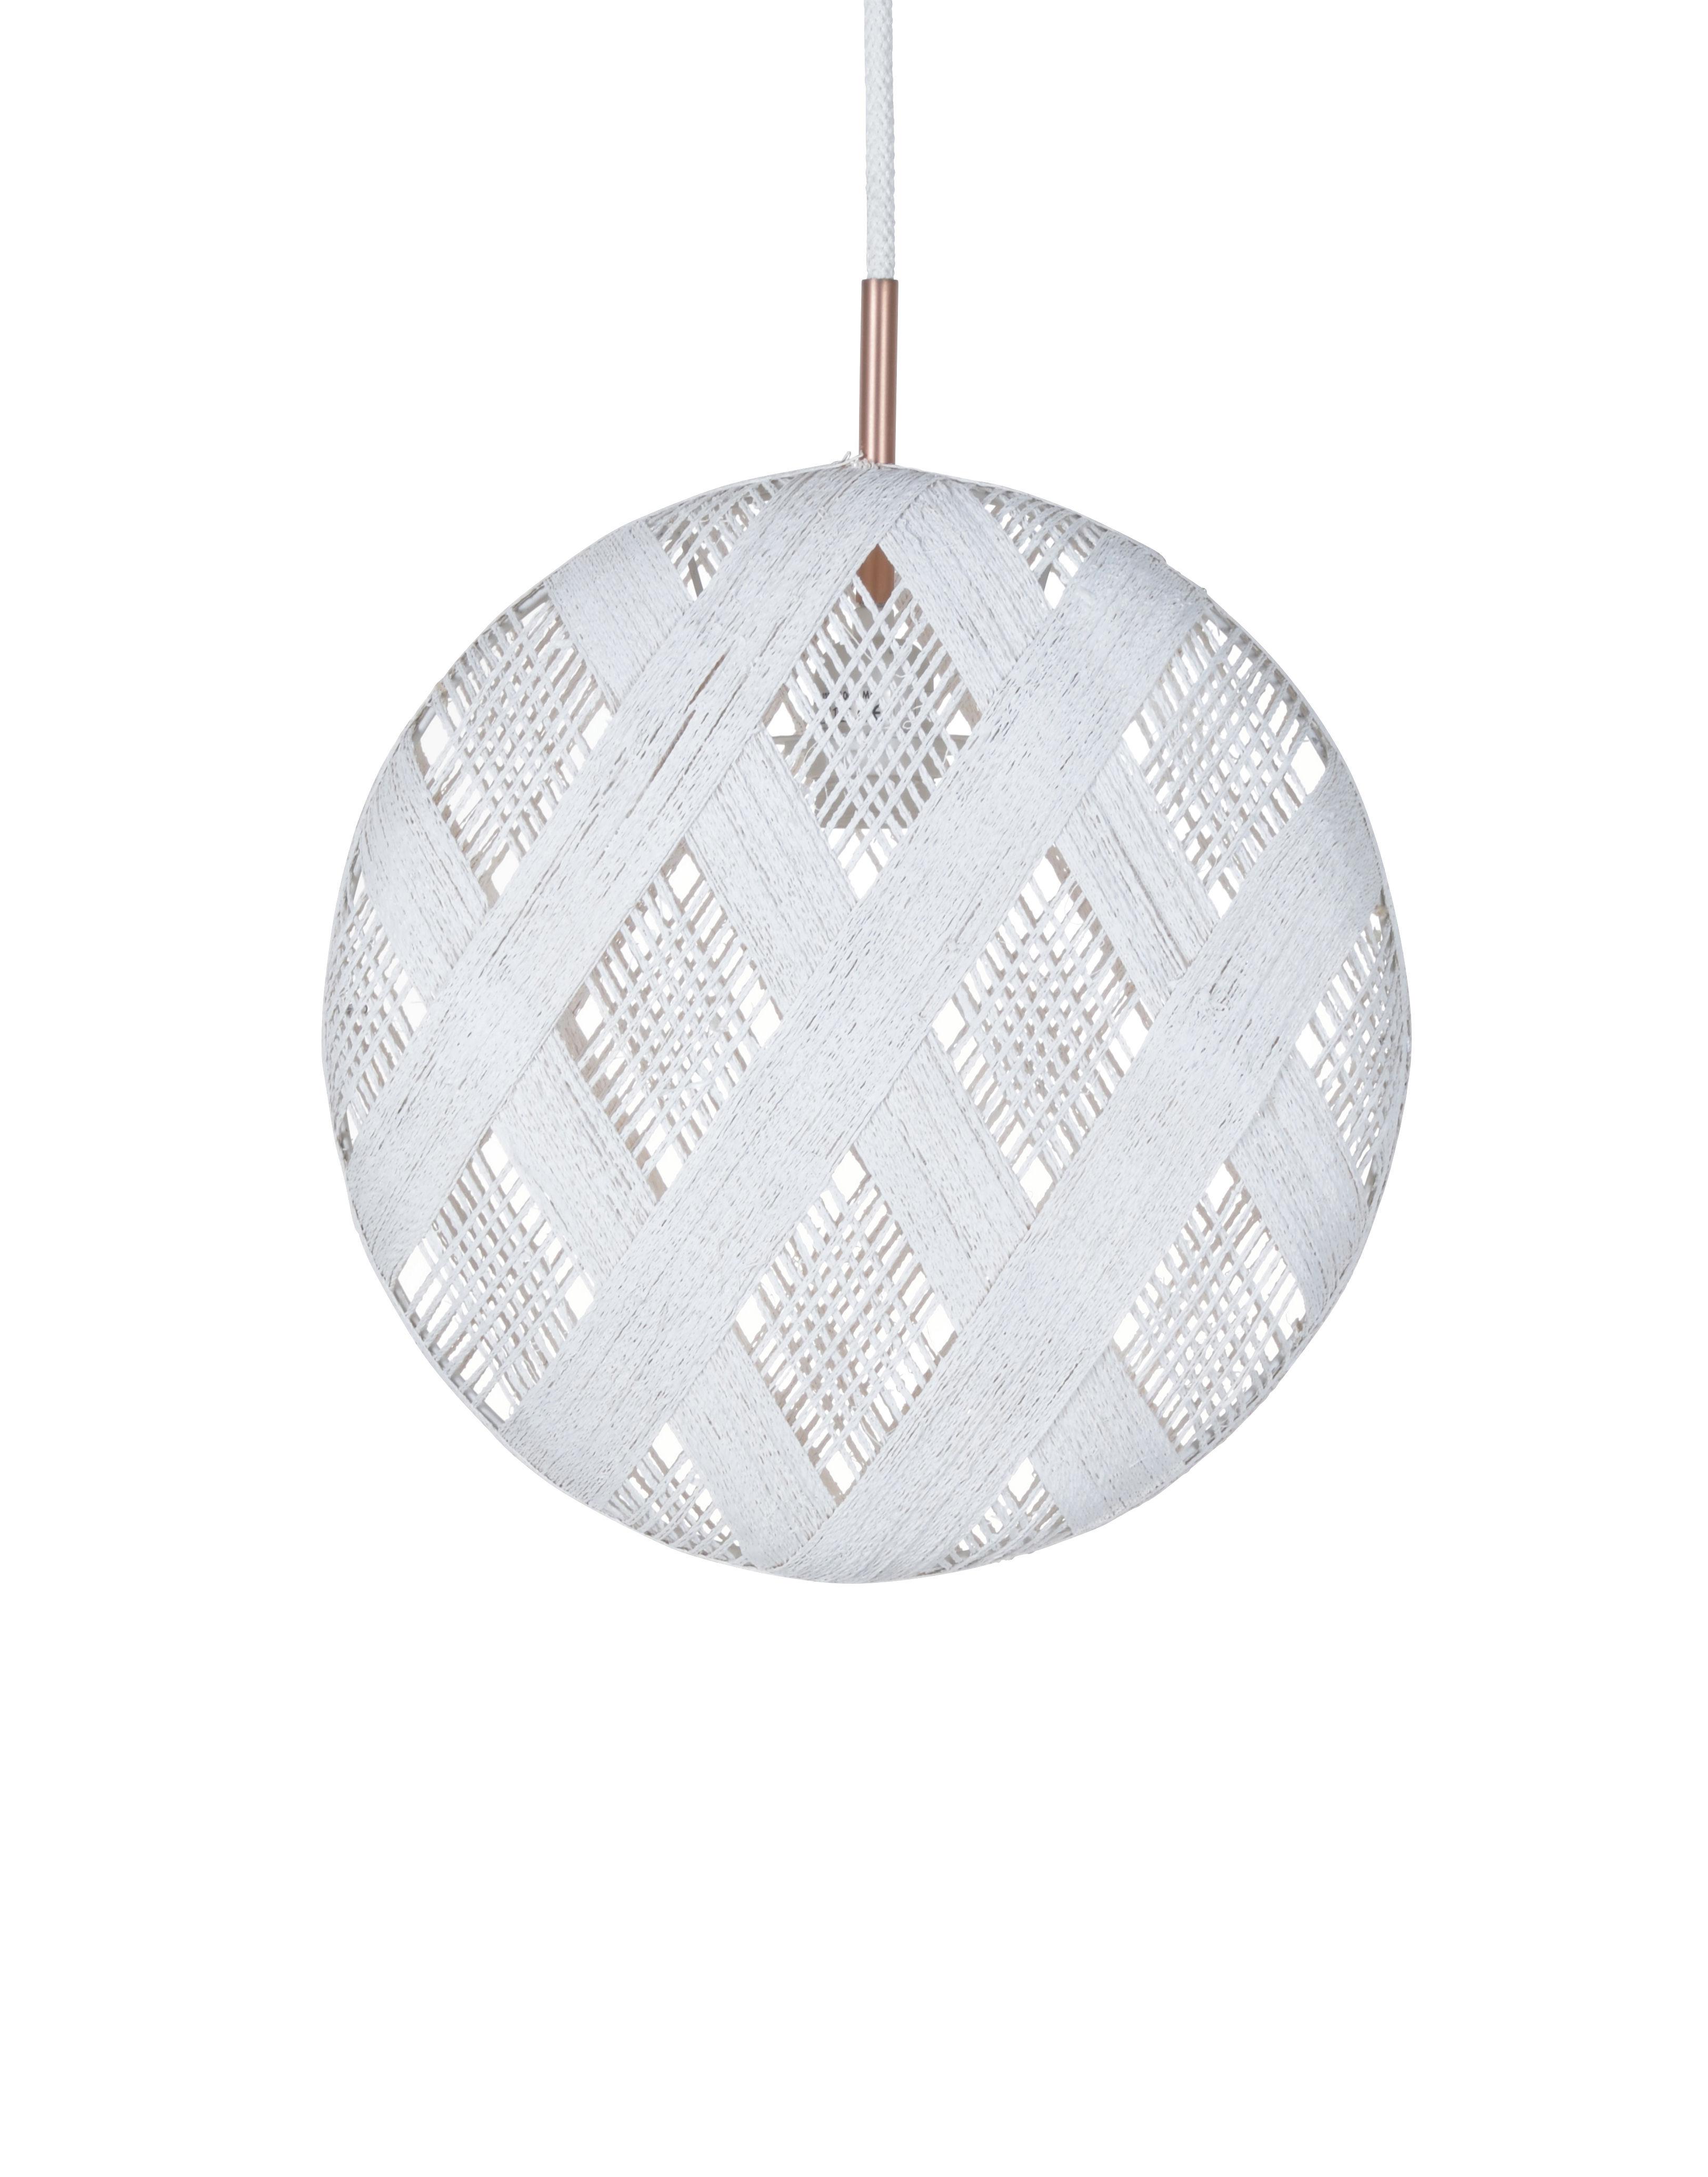 Lighting - Pendant Lighting - Chanpen Diamond Pendant - Ø 36 cm by Forestier - White / Diamond patterns - Woven acaba